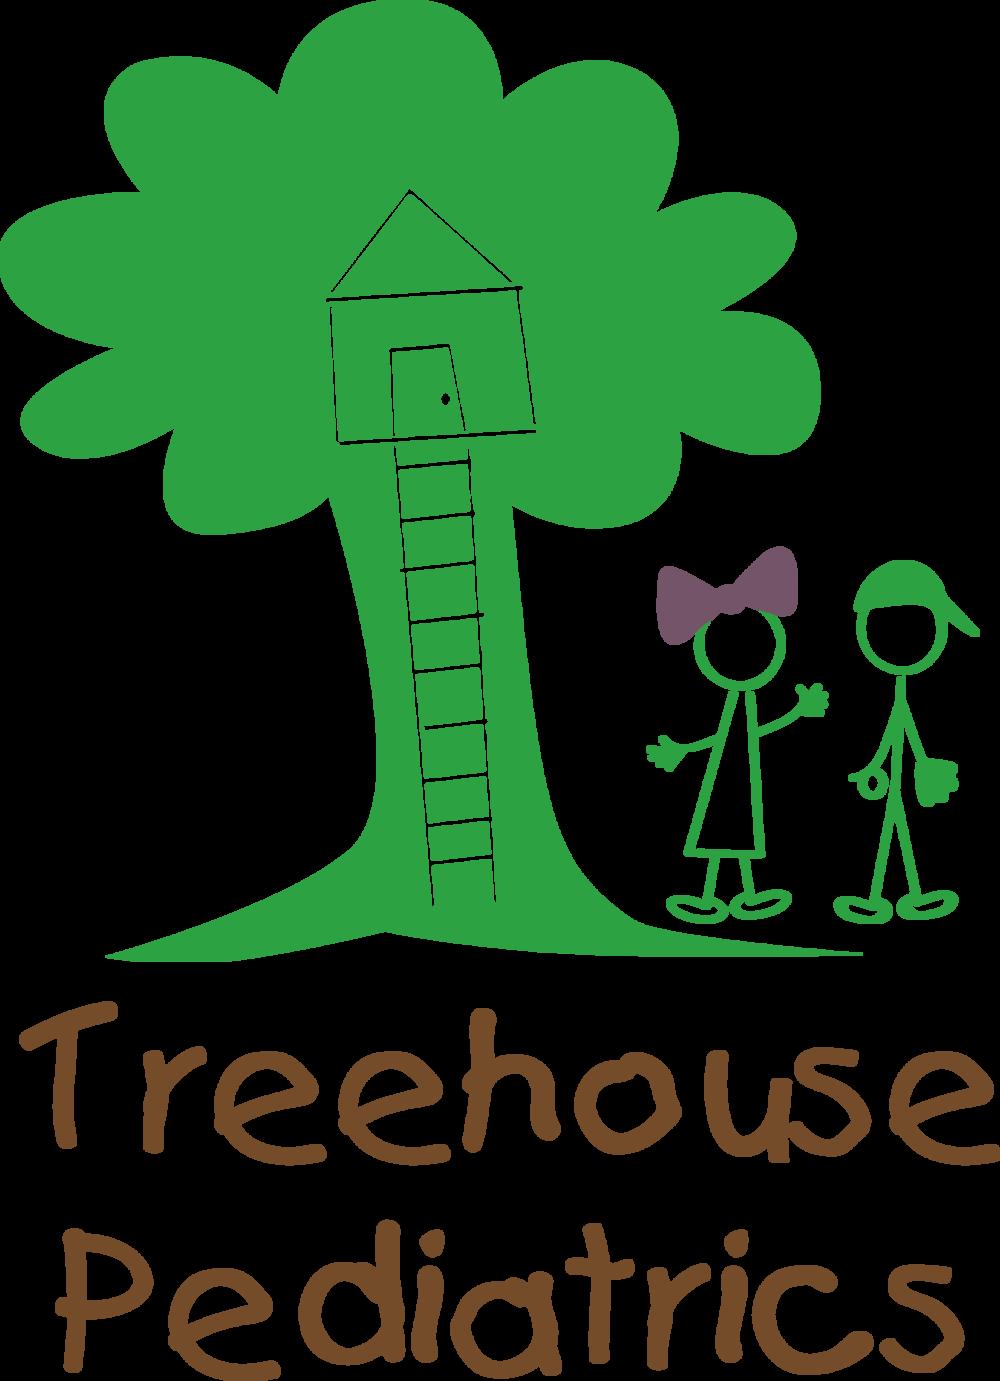 Treehouse Pediatrics_LOGO.png